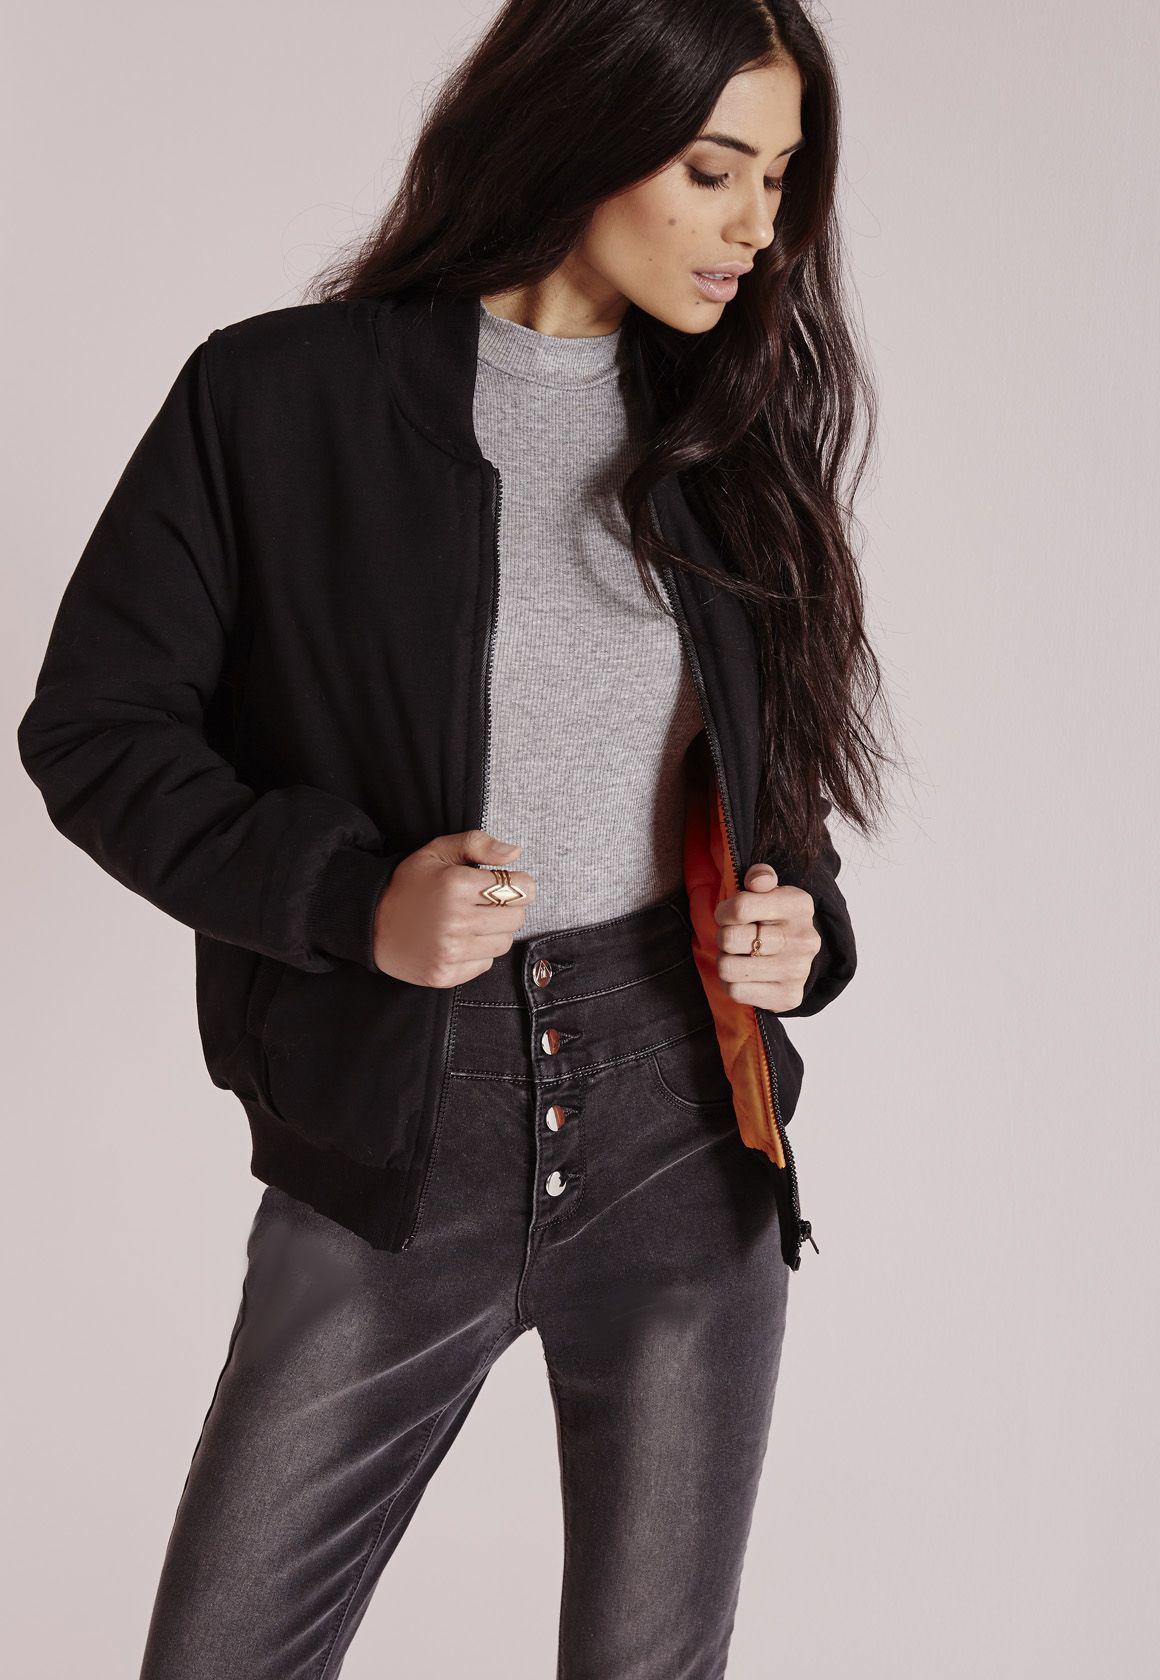 Slim Fit Bomber Jacket For Women S Slim Fit Bomber Jacket Bomber Jacket Black Bomber Jacket [ 1680 x 1160 Pixel ]